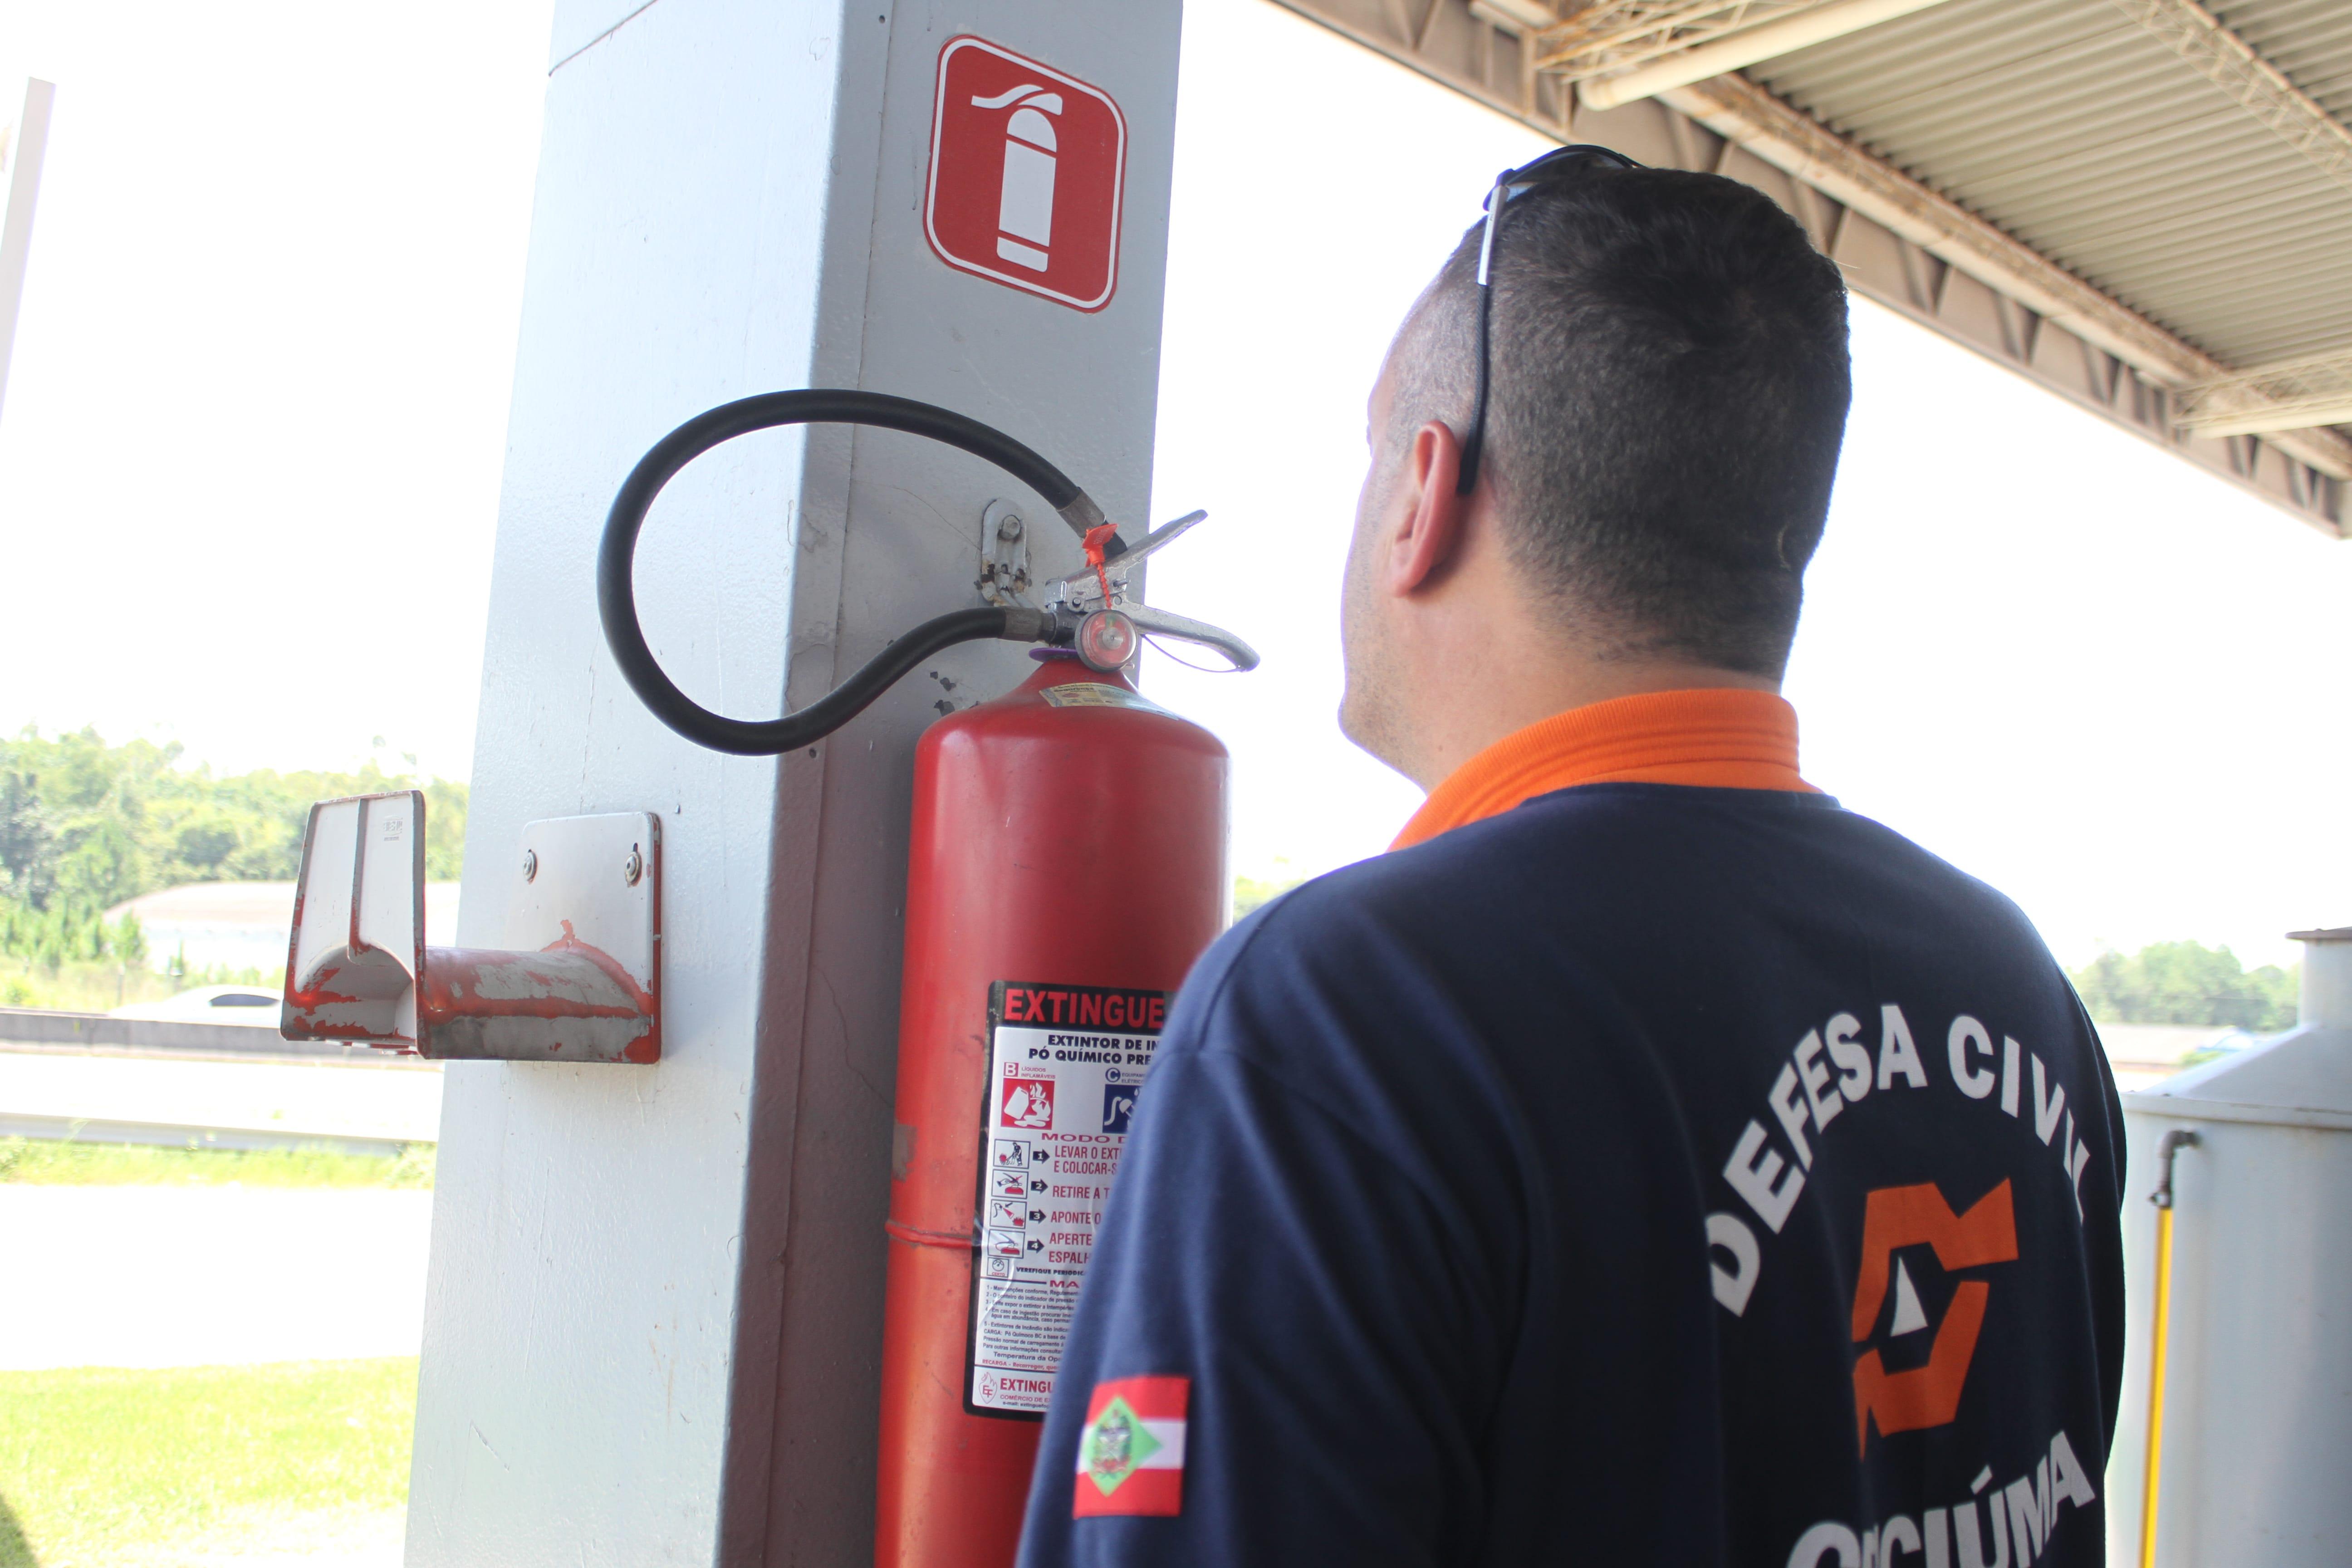 Defesa_Civil_fiscaliza_postos_de_combustiveis_em_Criciuma_10.JPG